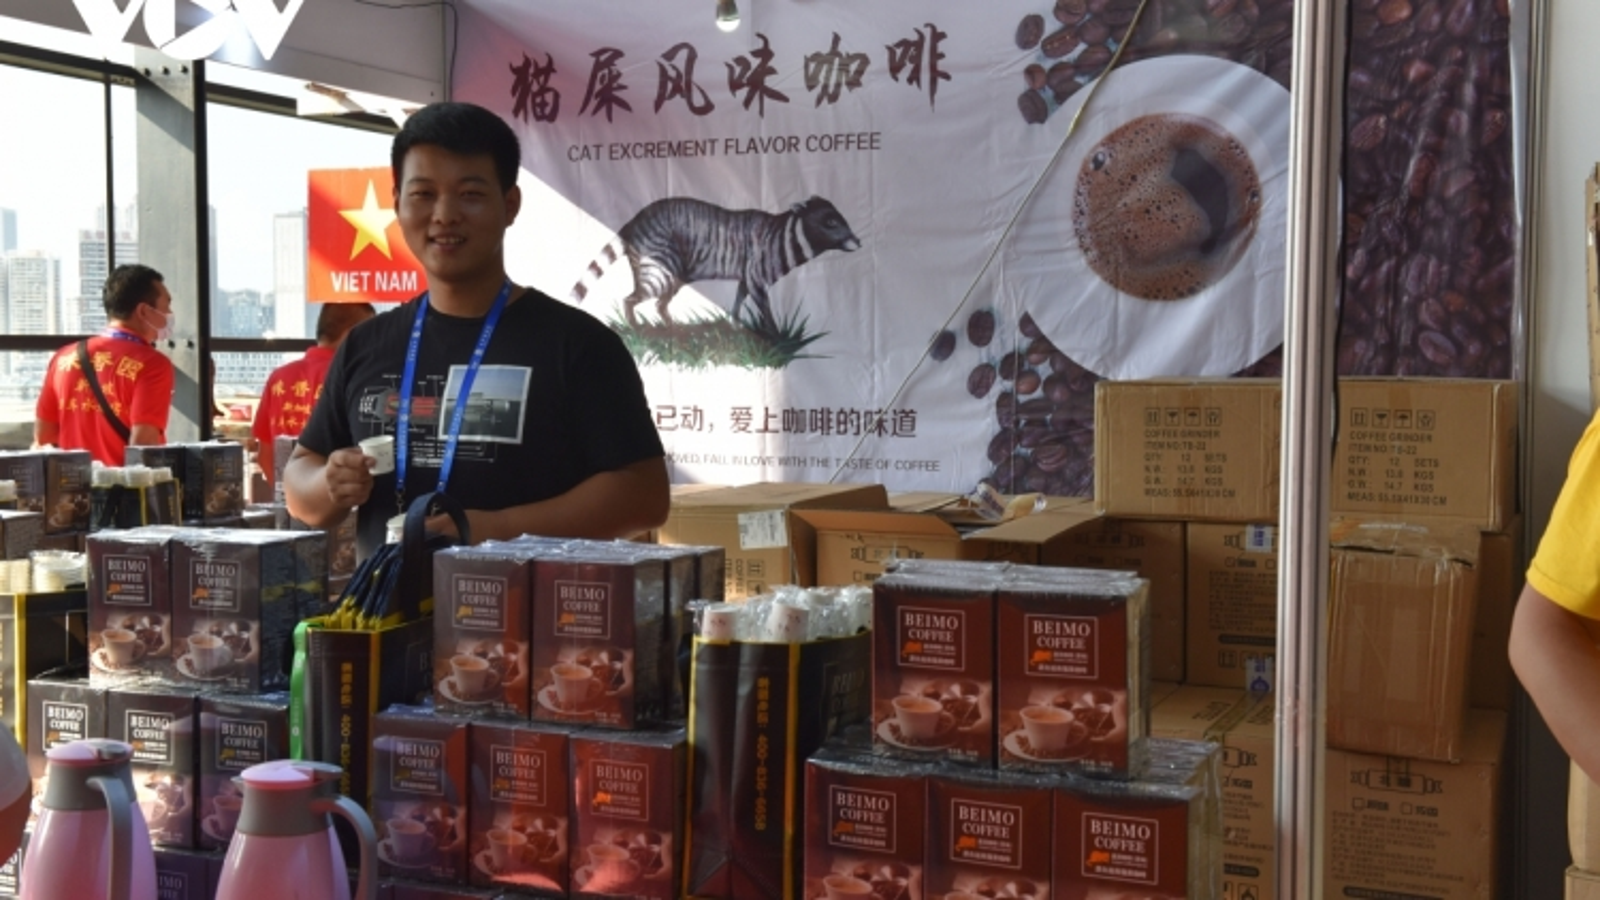 BếmạcHội chợ ASEAN - Trung Quốc lần thứ 18